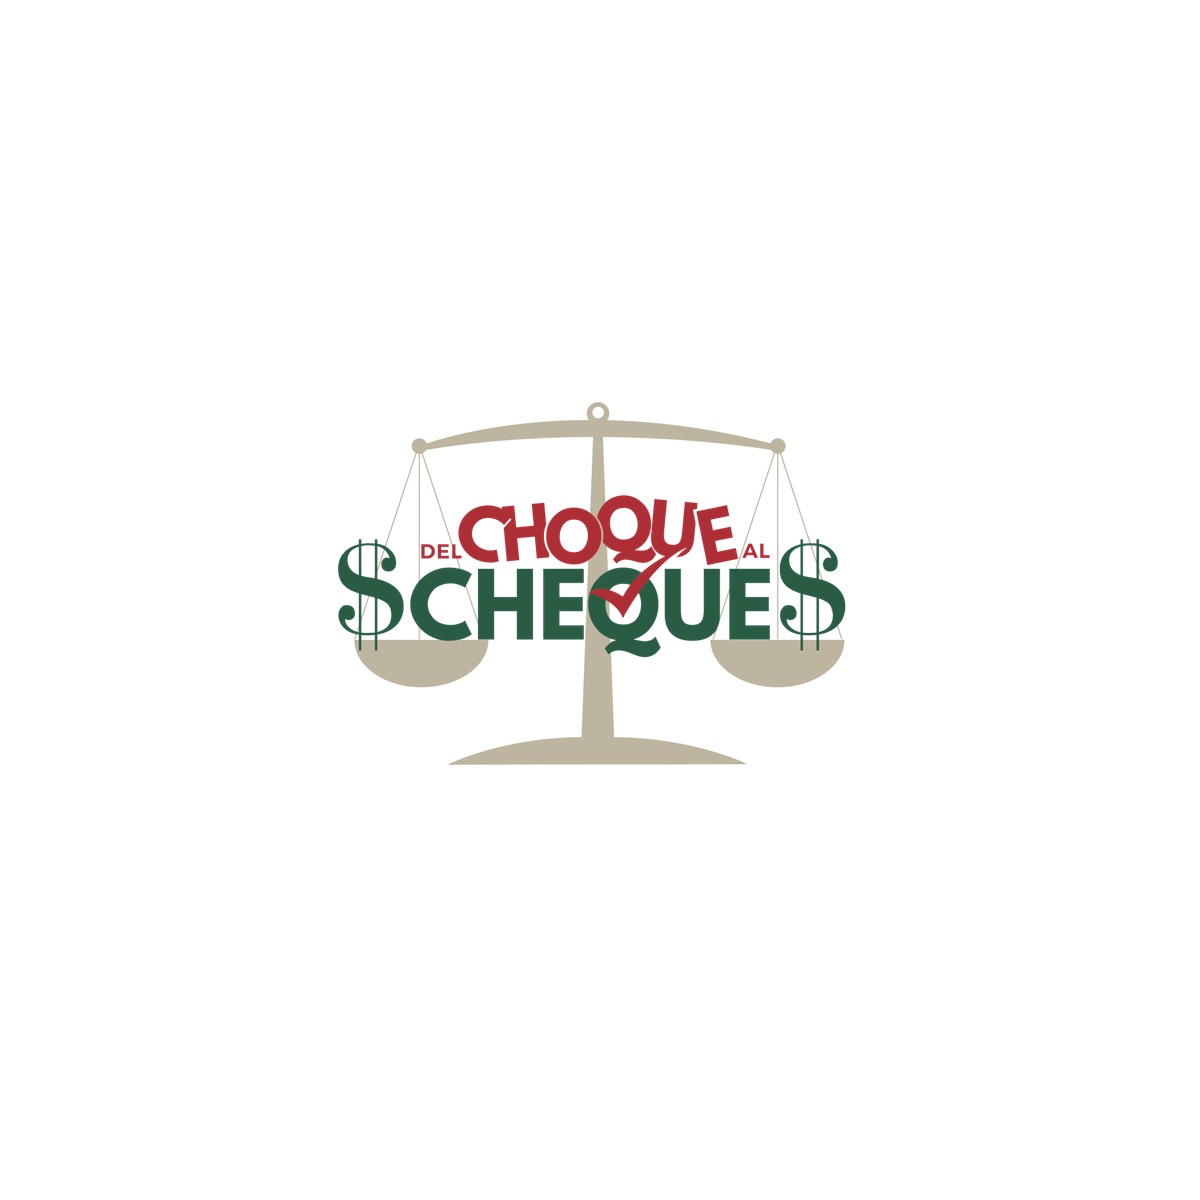 Updates to Choque Cheque logo